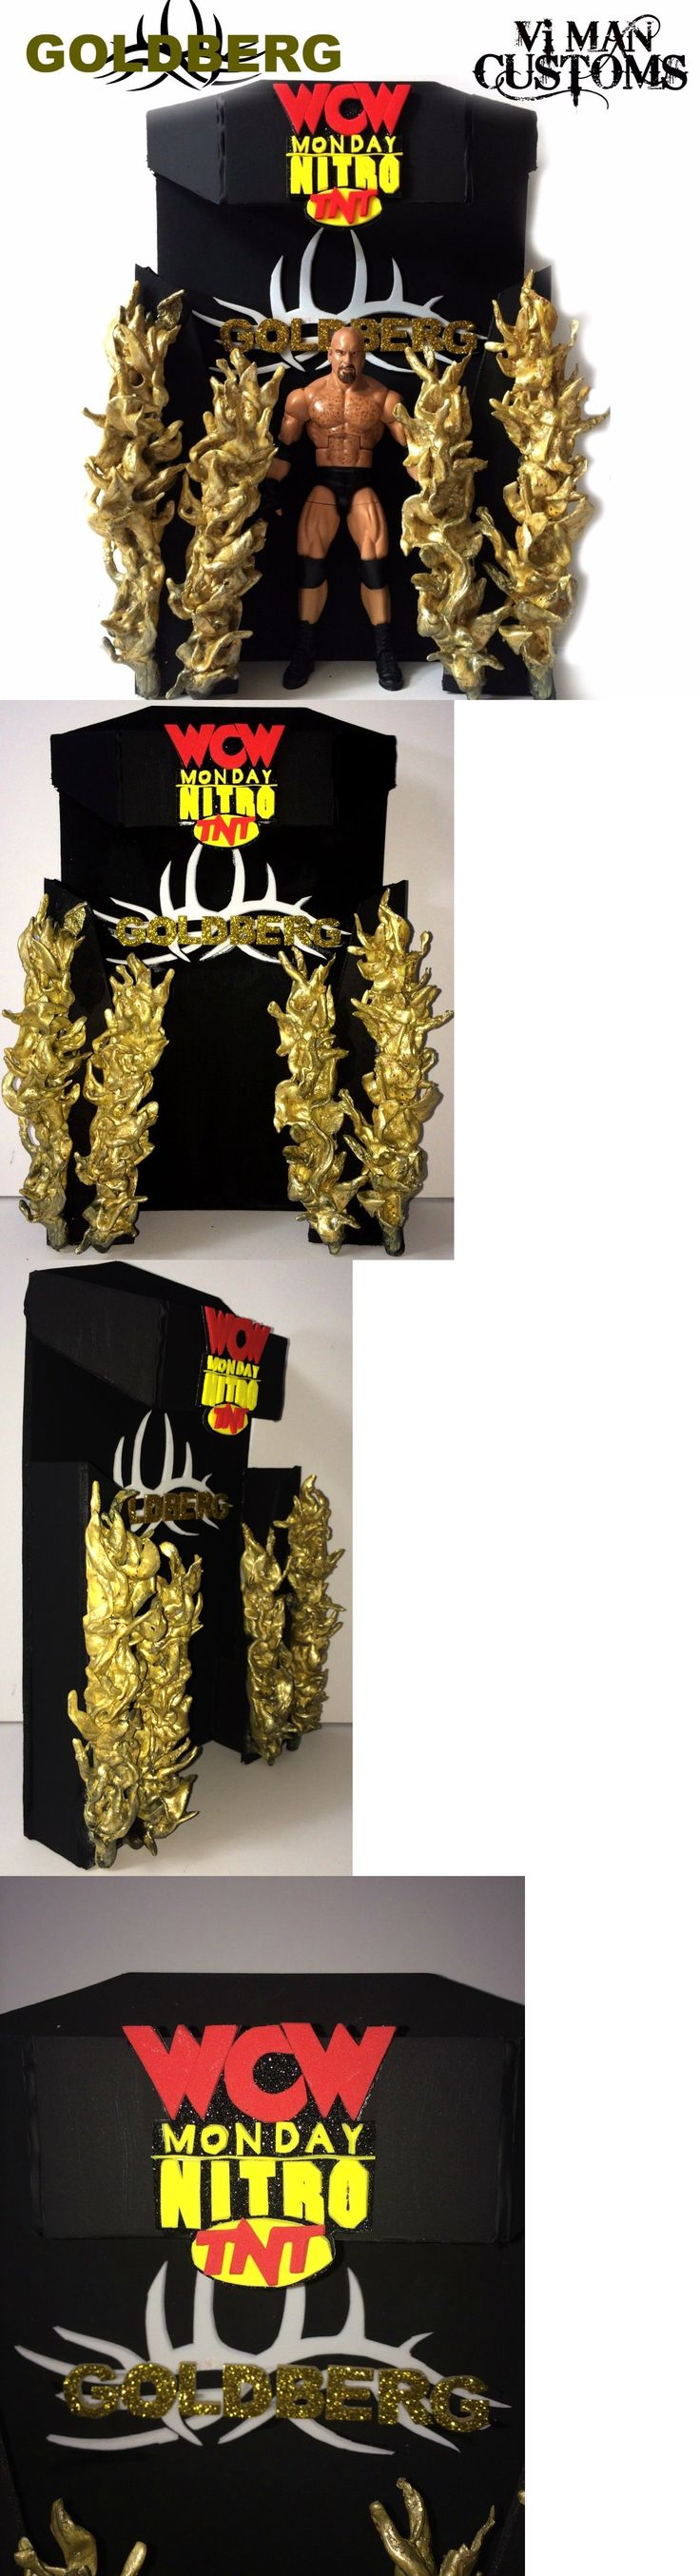 Sports 754: Wwe Mattel Elite Custom Bill Goldberg Figure And Wcw Nitro Pyro Display Stand -> BUY IT NOW ONLY: $110 on eBay!